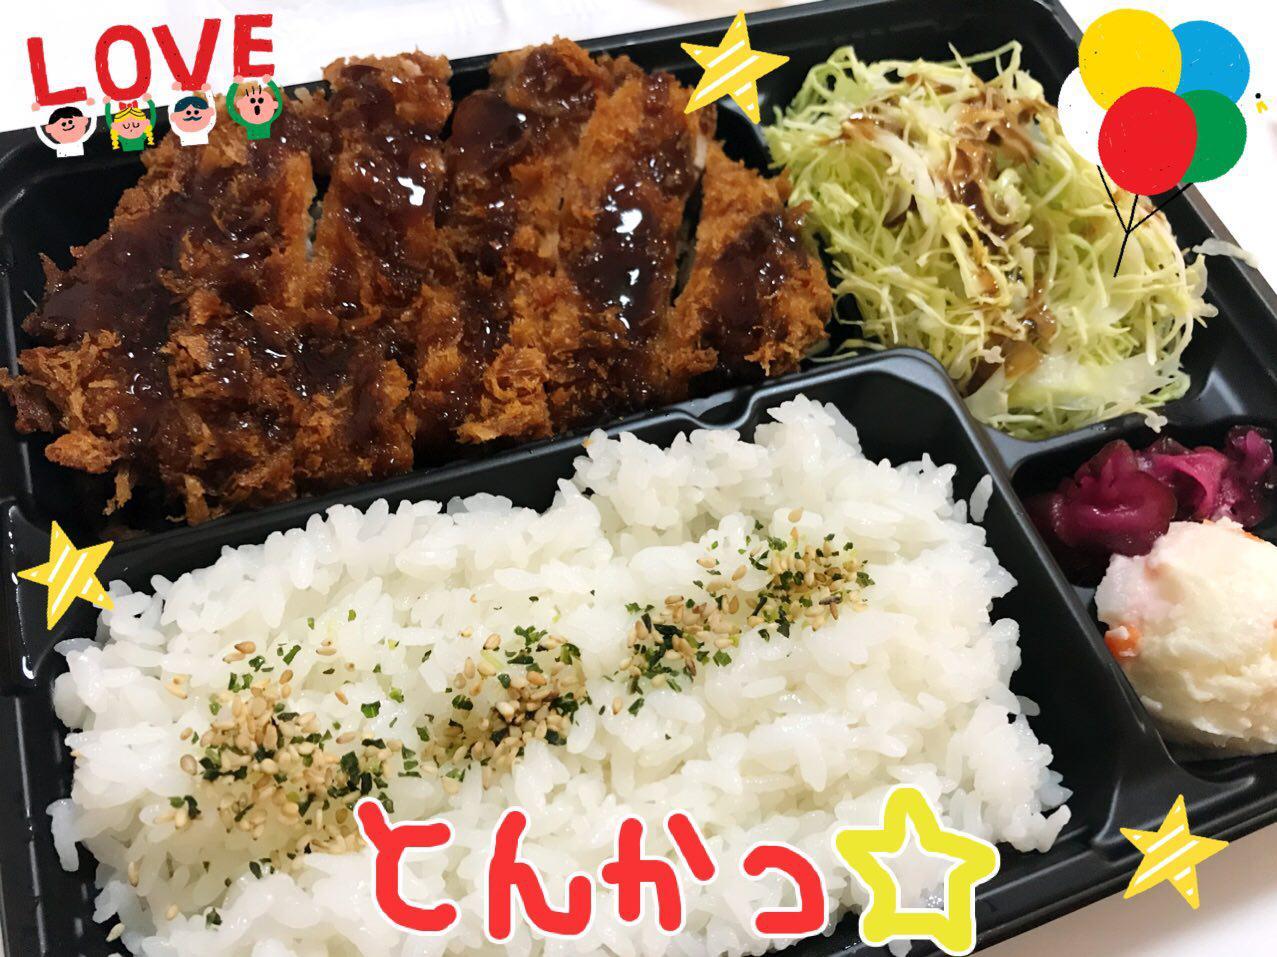 photo_2018-01-29_21-36-12.jpg